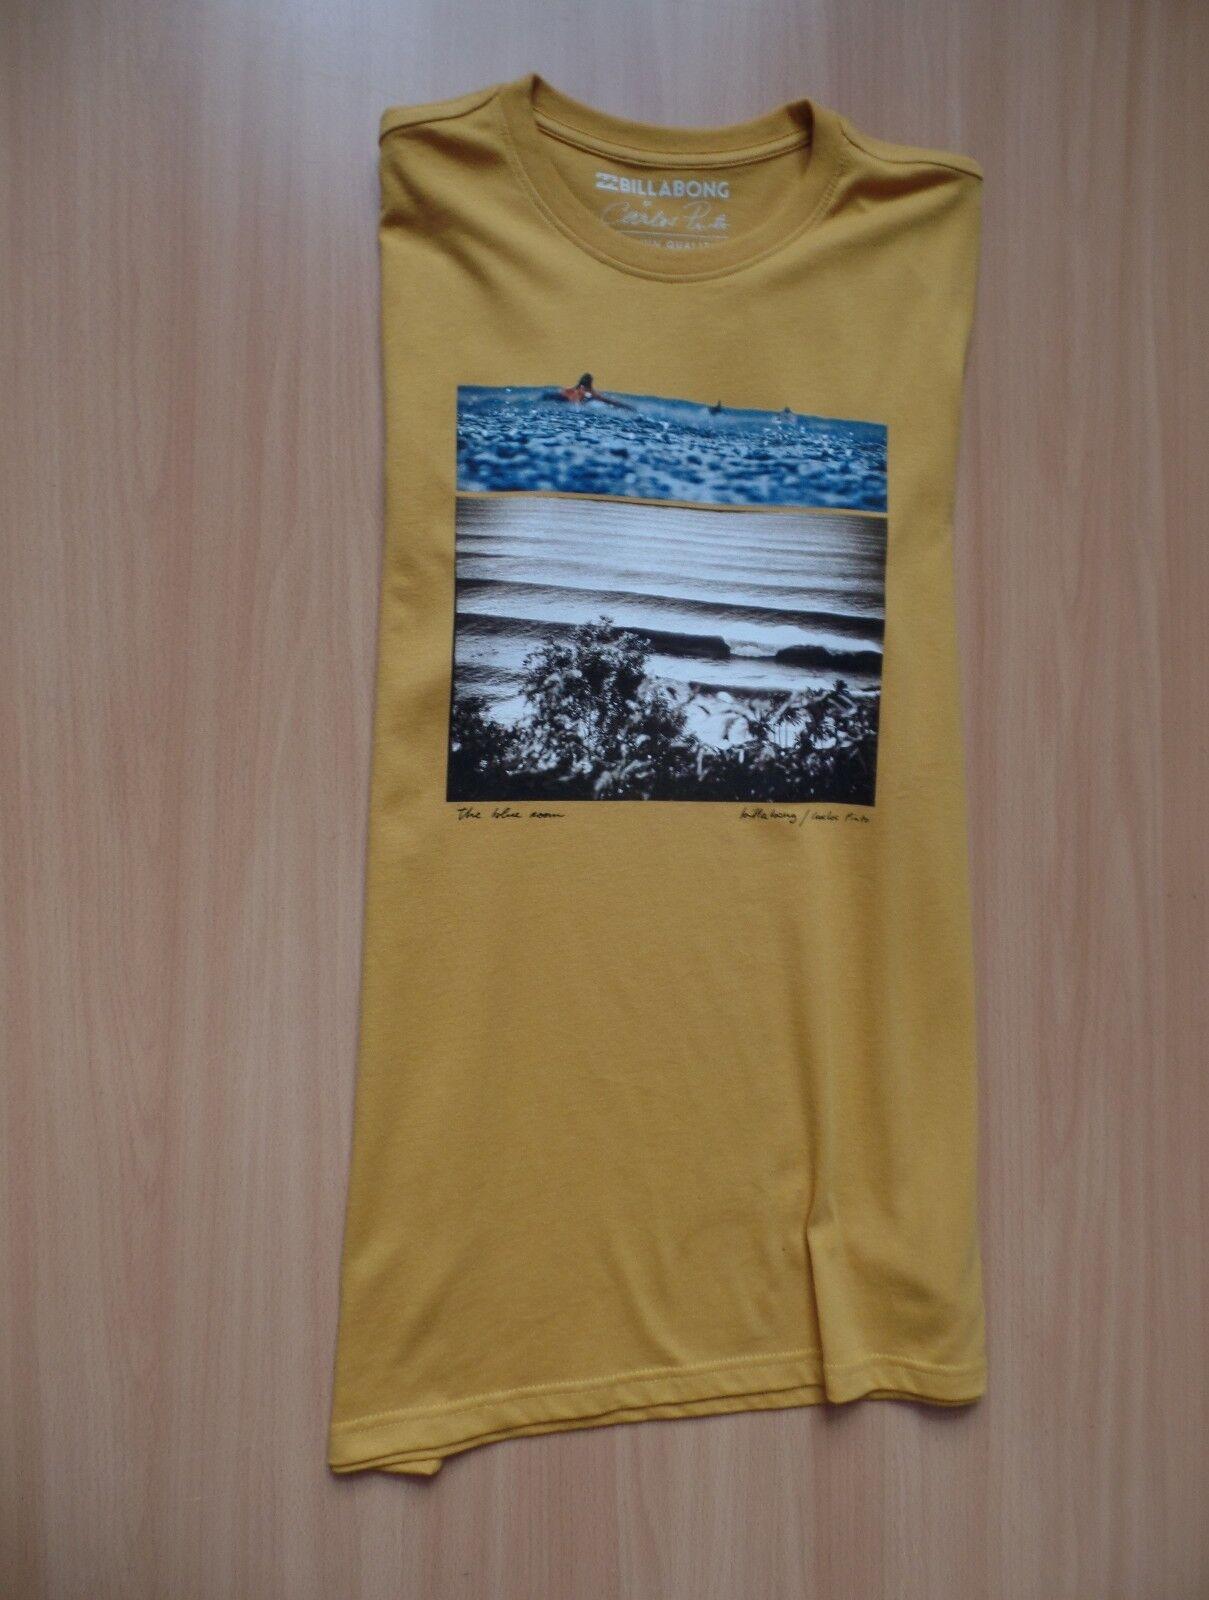 Billabong-caballeros Billabong-caballeros Billabong-caballeros t-shirt azul Dream Tee-talla L-nuevo - 878380